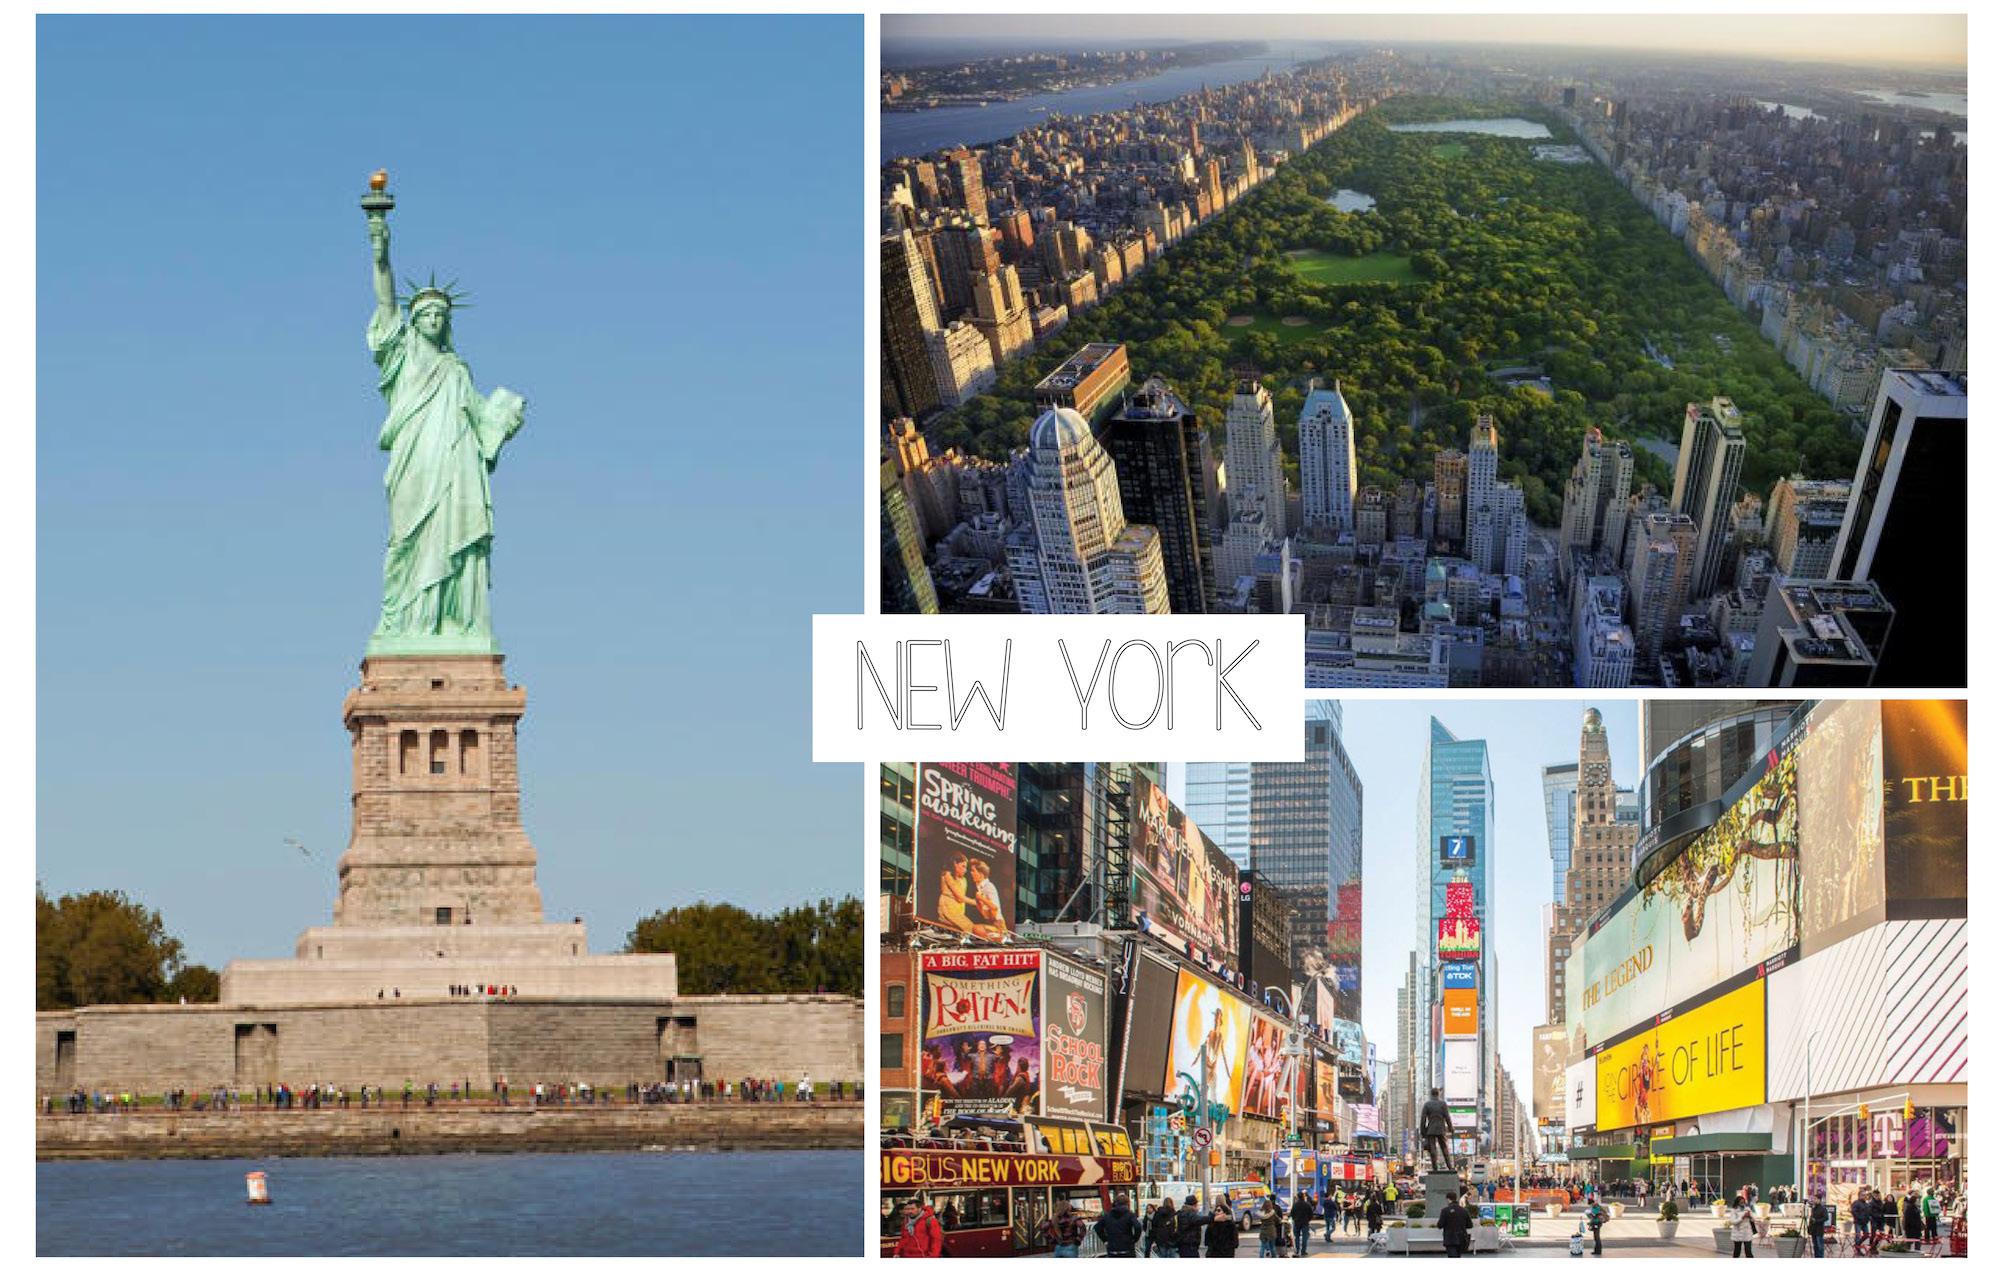 Road Trip Canada USA - New York